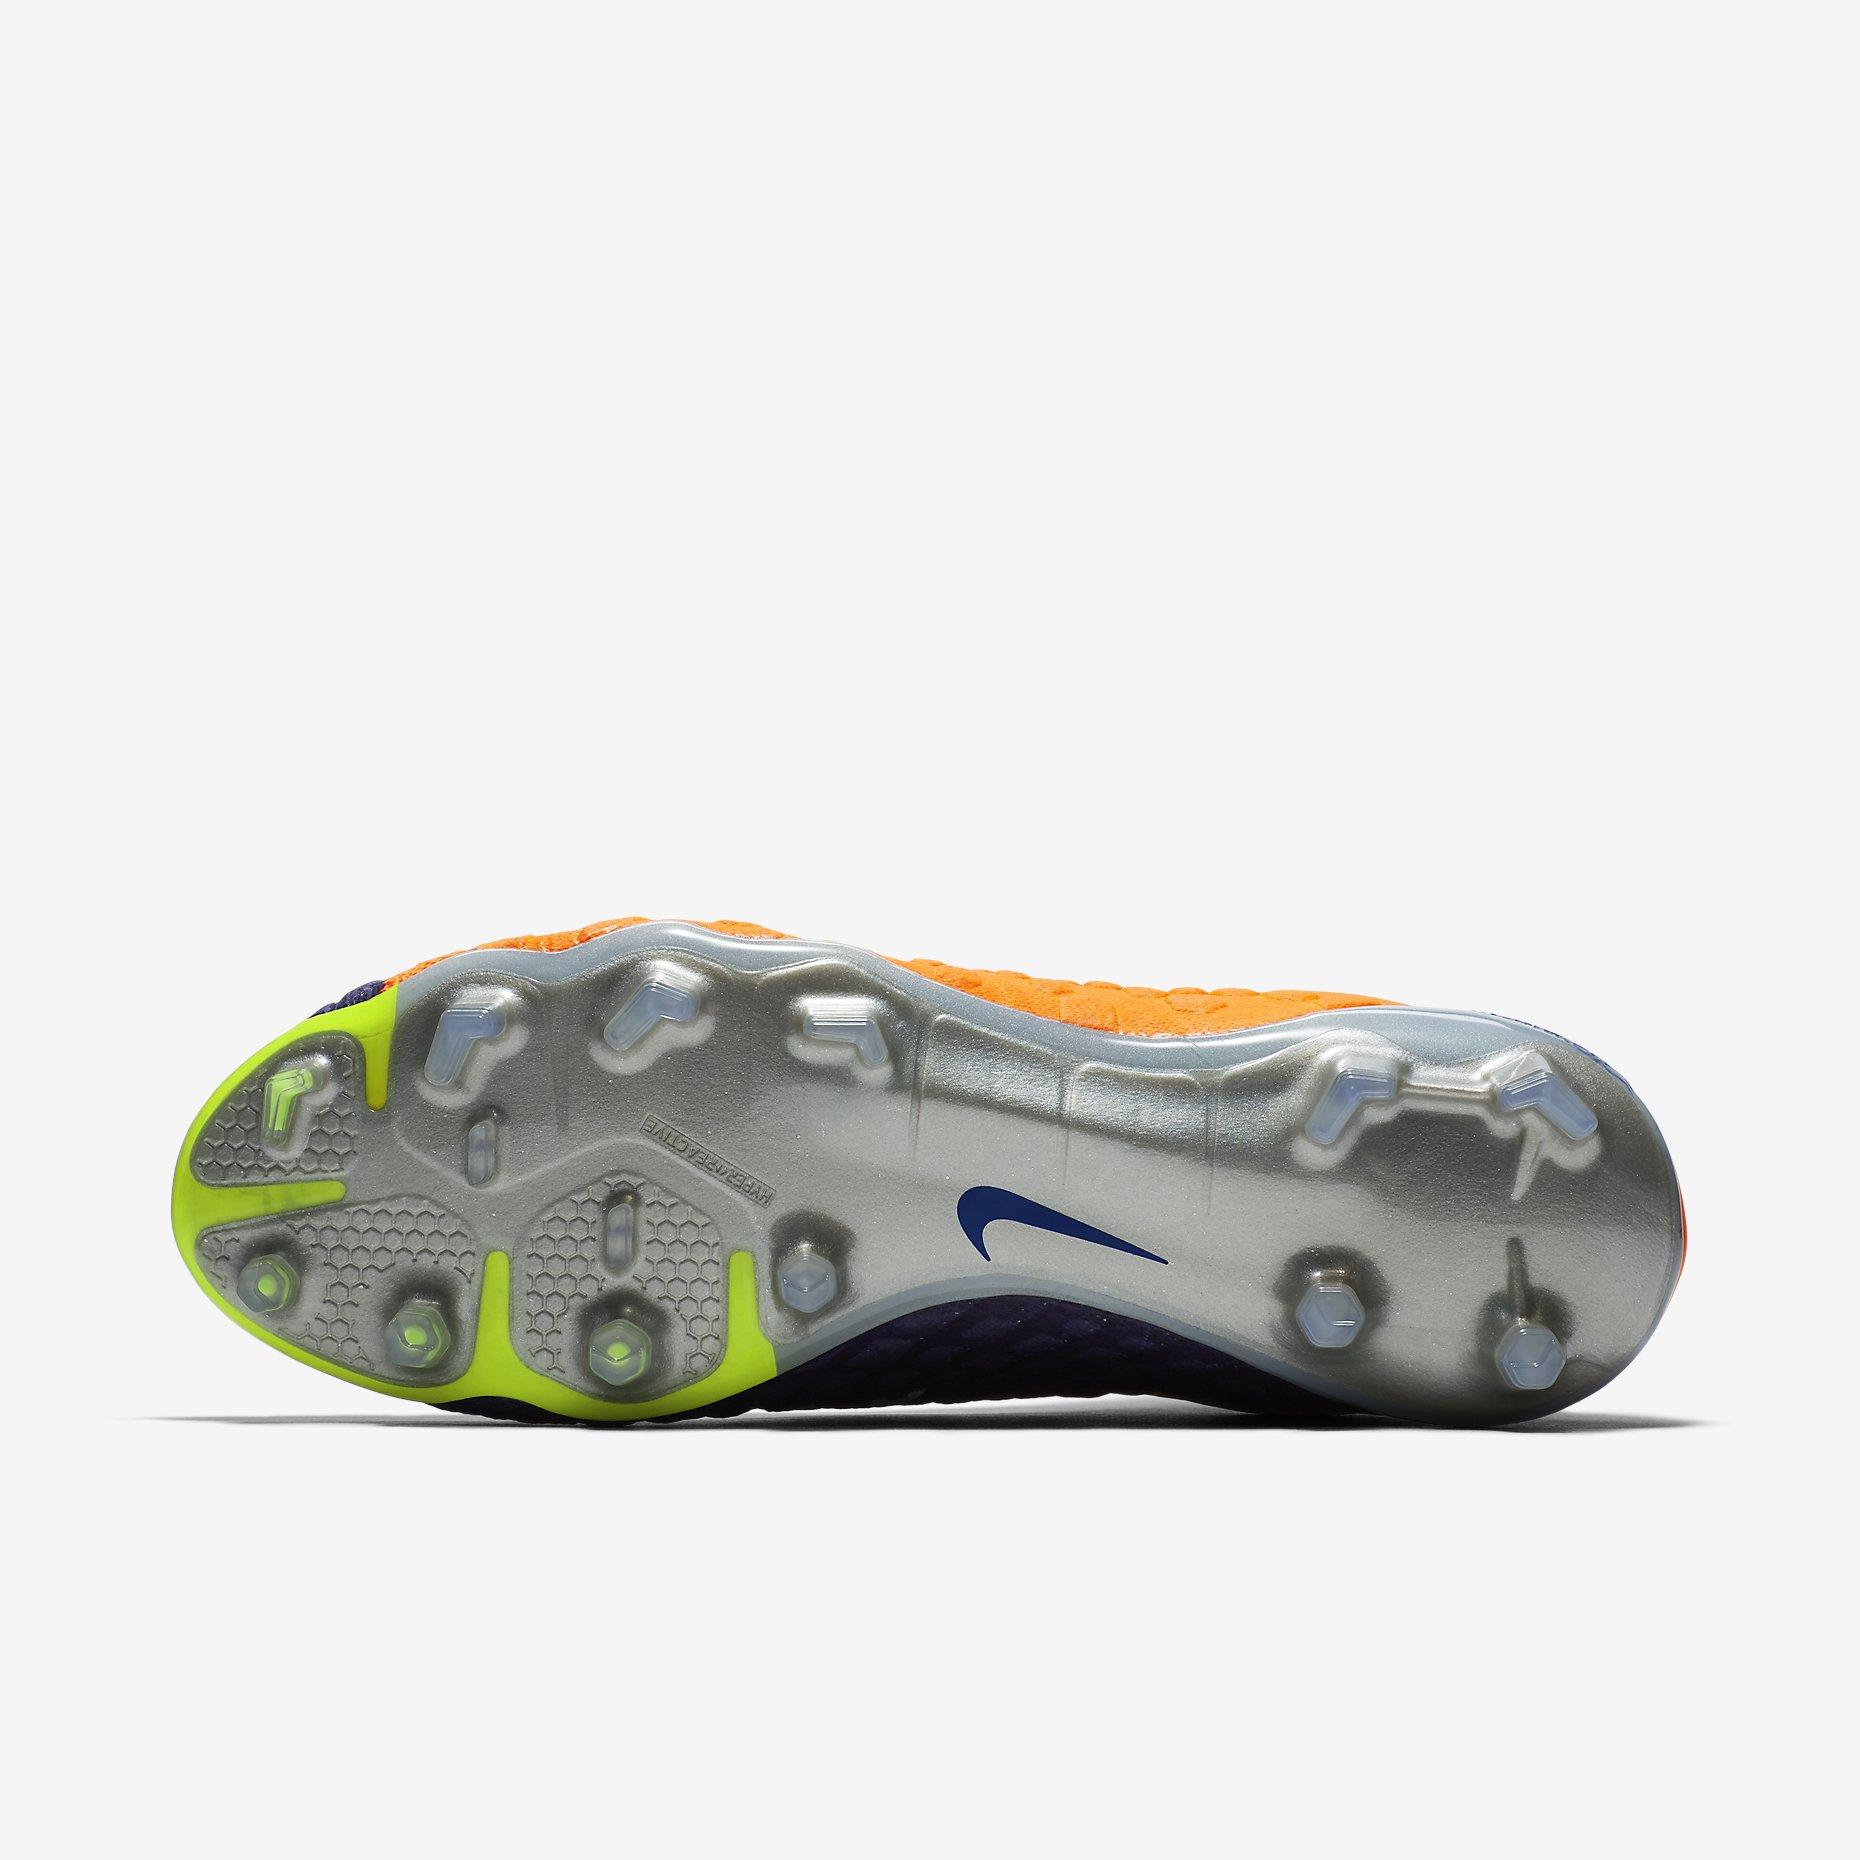 8b7cba785 Nike Hypervenom Phantom III Dynamic Fit FG Time To Shine - Deep Royal Blue  / Total Crimson / Bright Citrus / Chrome